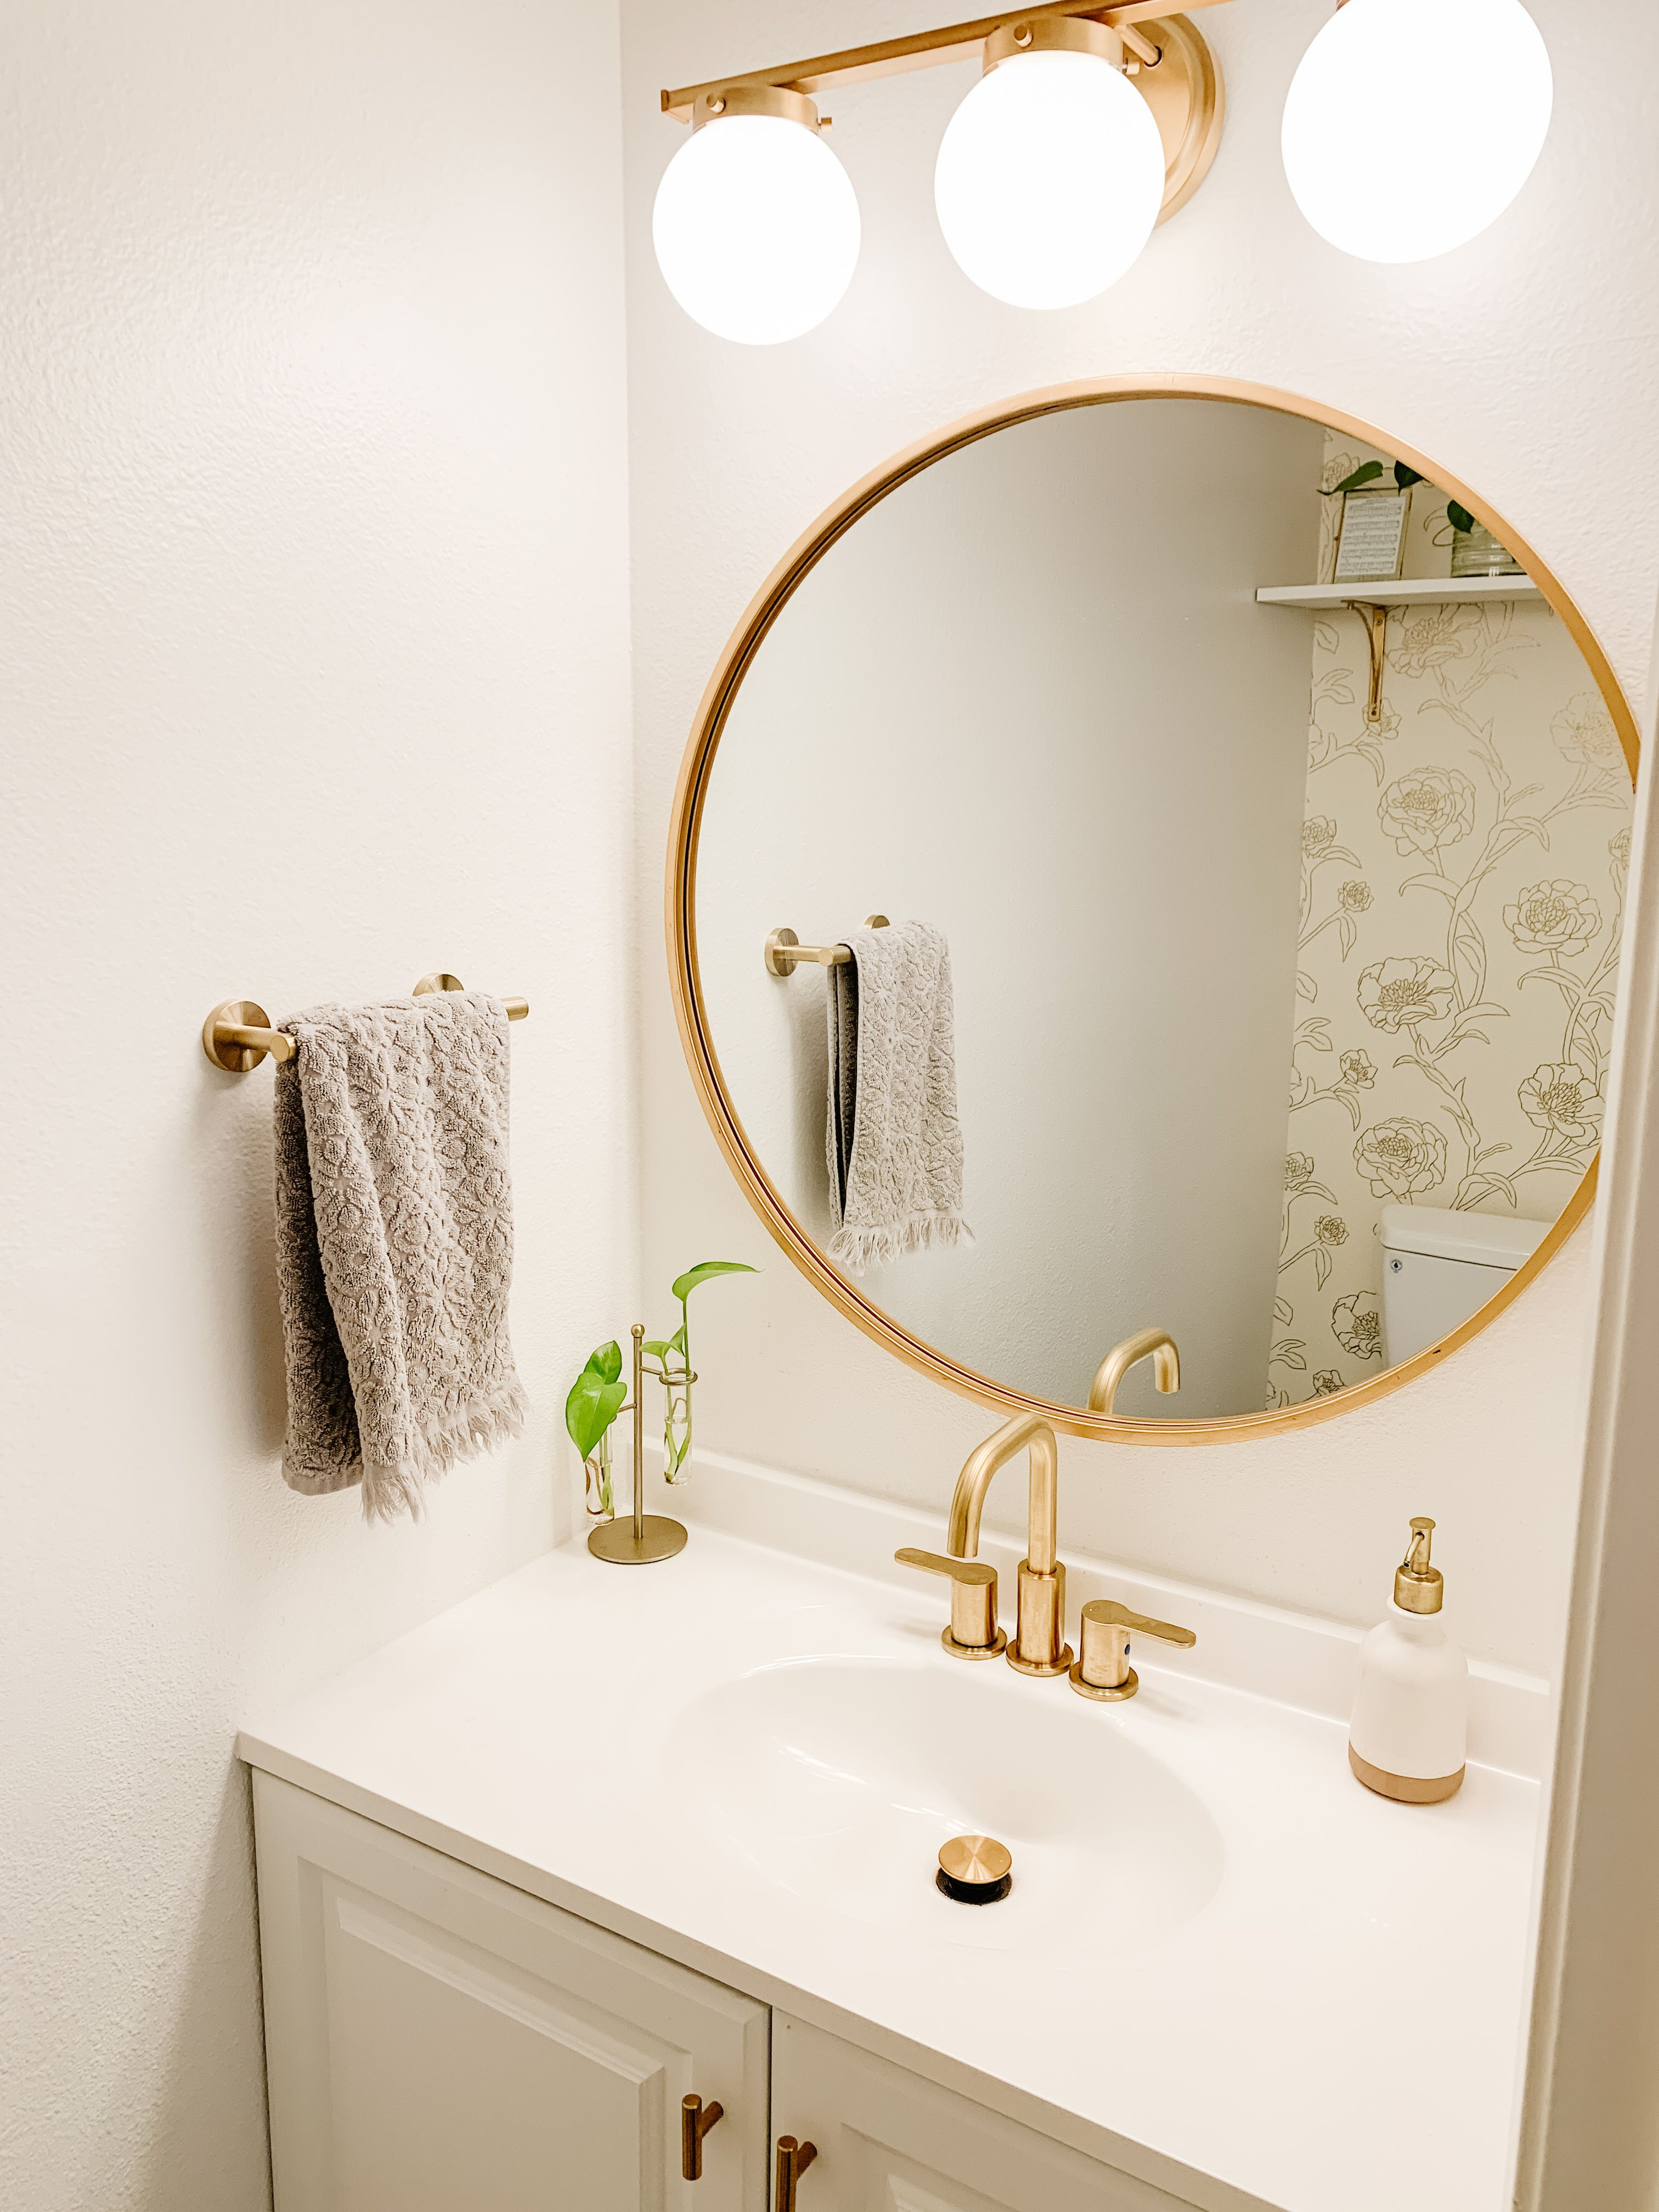 Guest Bathroom Gold Bathroom Decor Small Bathroom Decor Guest Bathroom Bathroom decor ideas gold